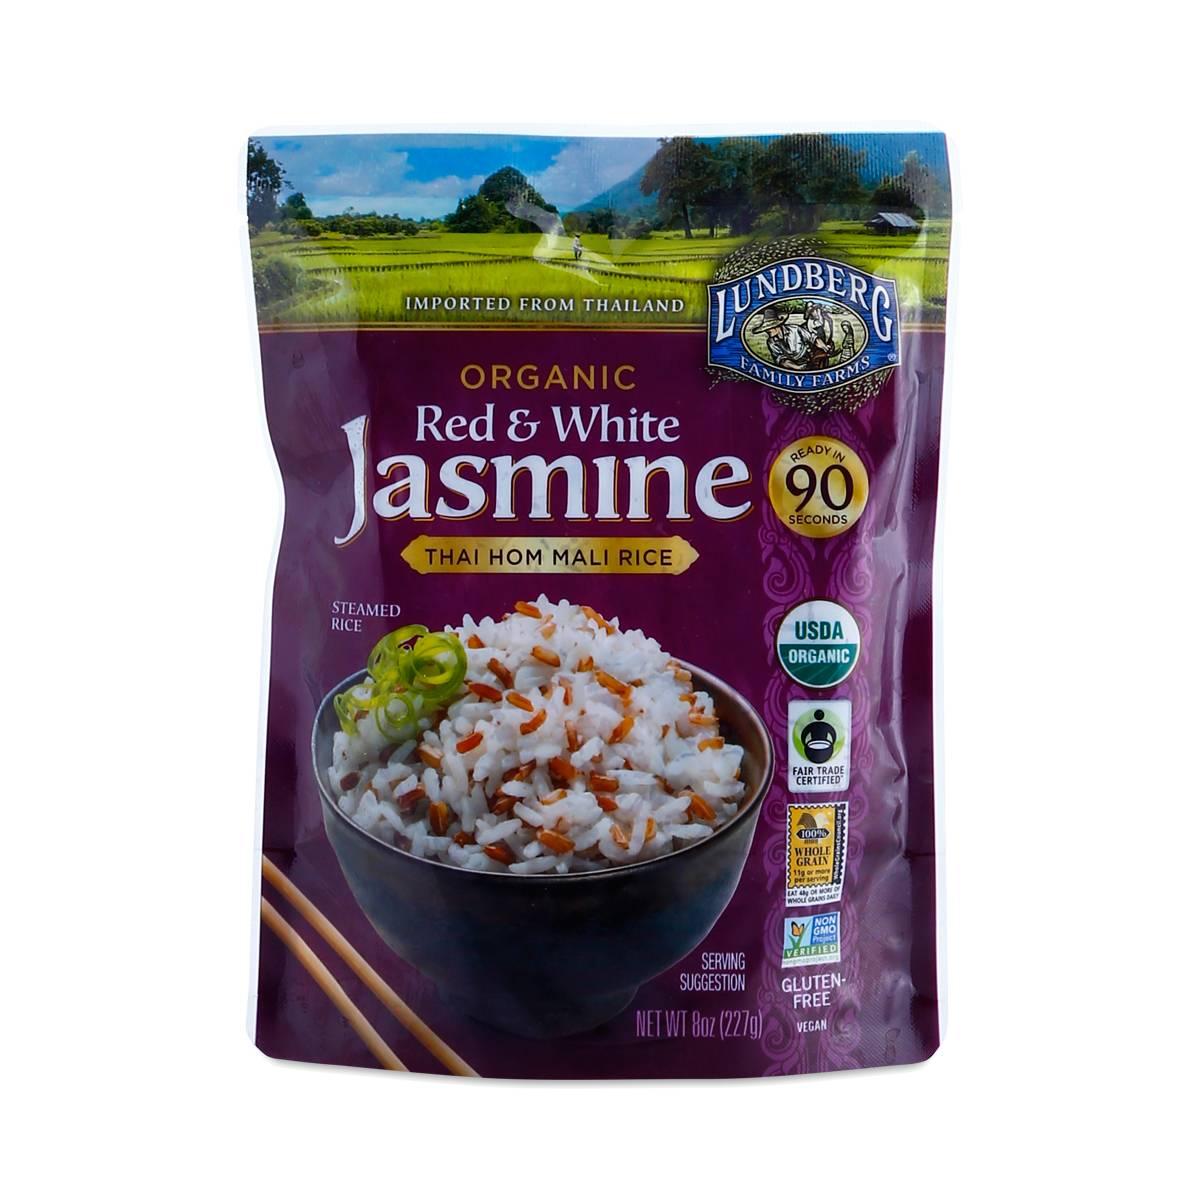 Organic Red & White Jasmine Rice by Lundberg Farms